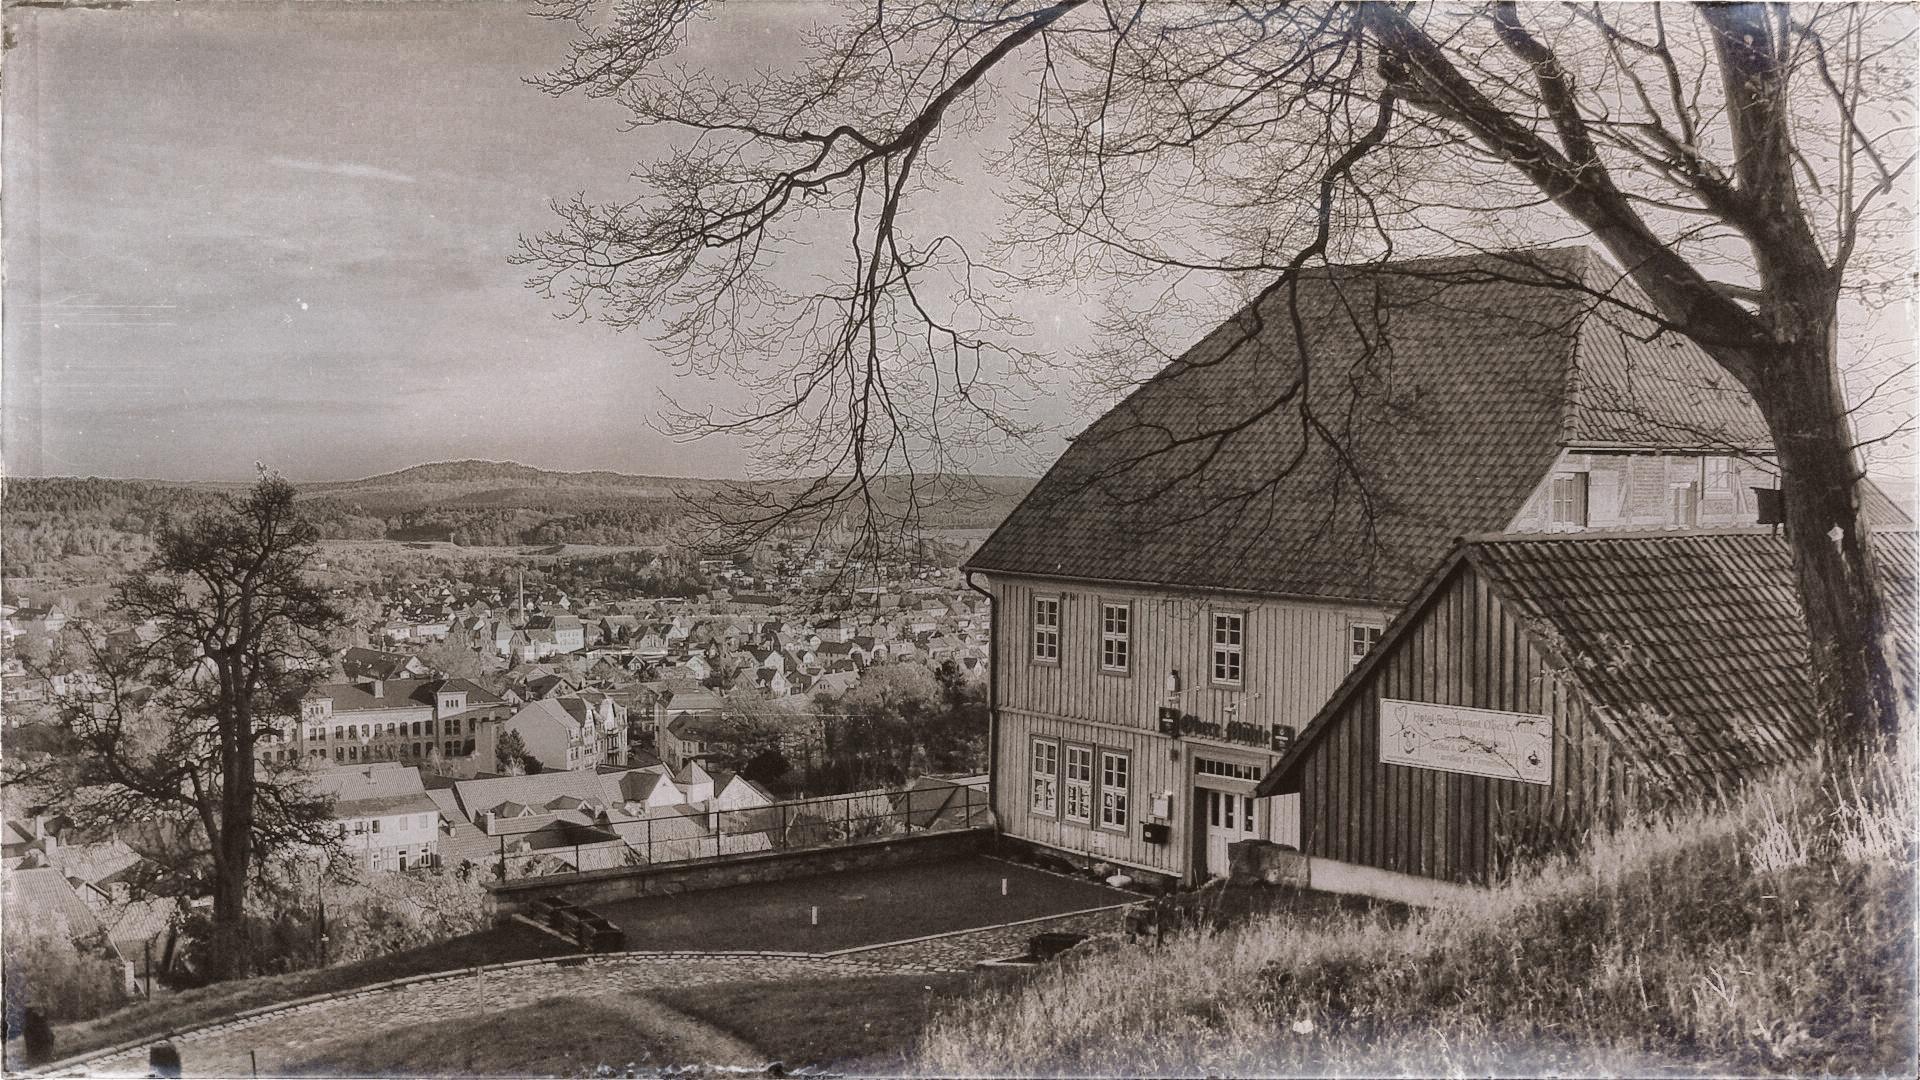 Obere Mühle Blankenburg